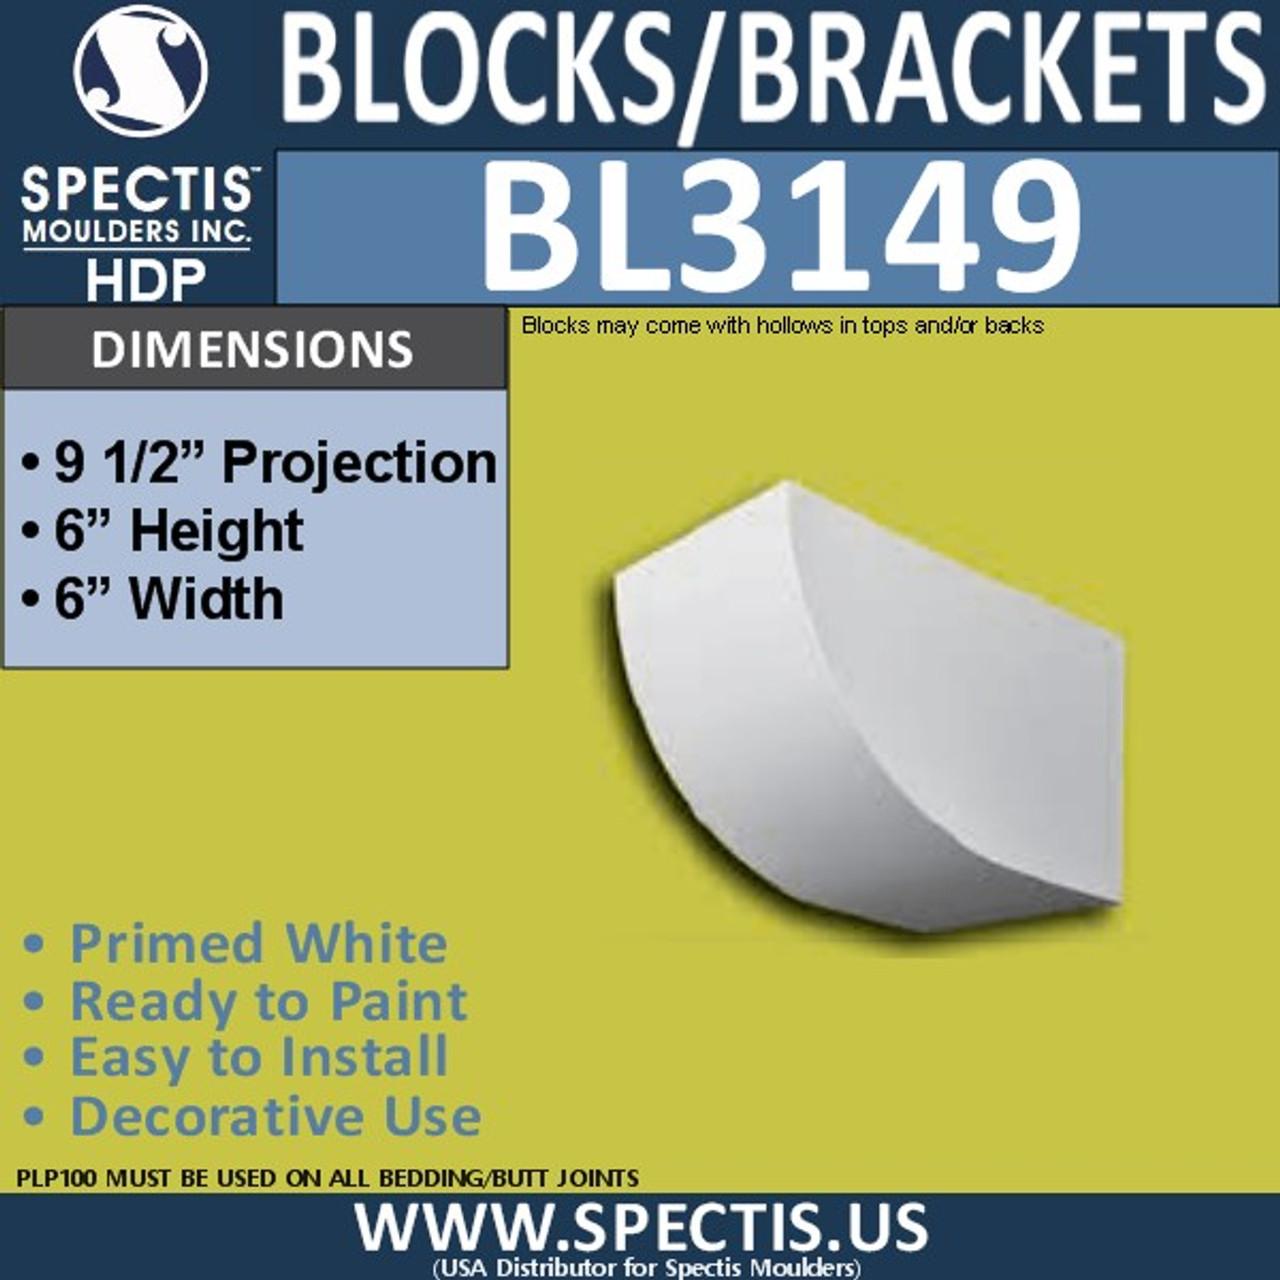 "BL3149 Eave Block or Bracket 6""W x 6""H x 9.5""P"